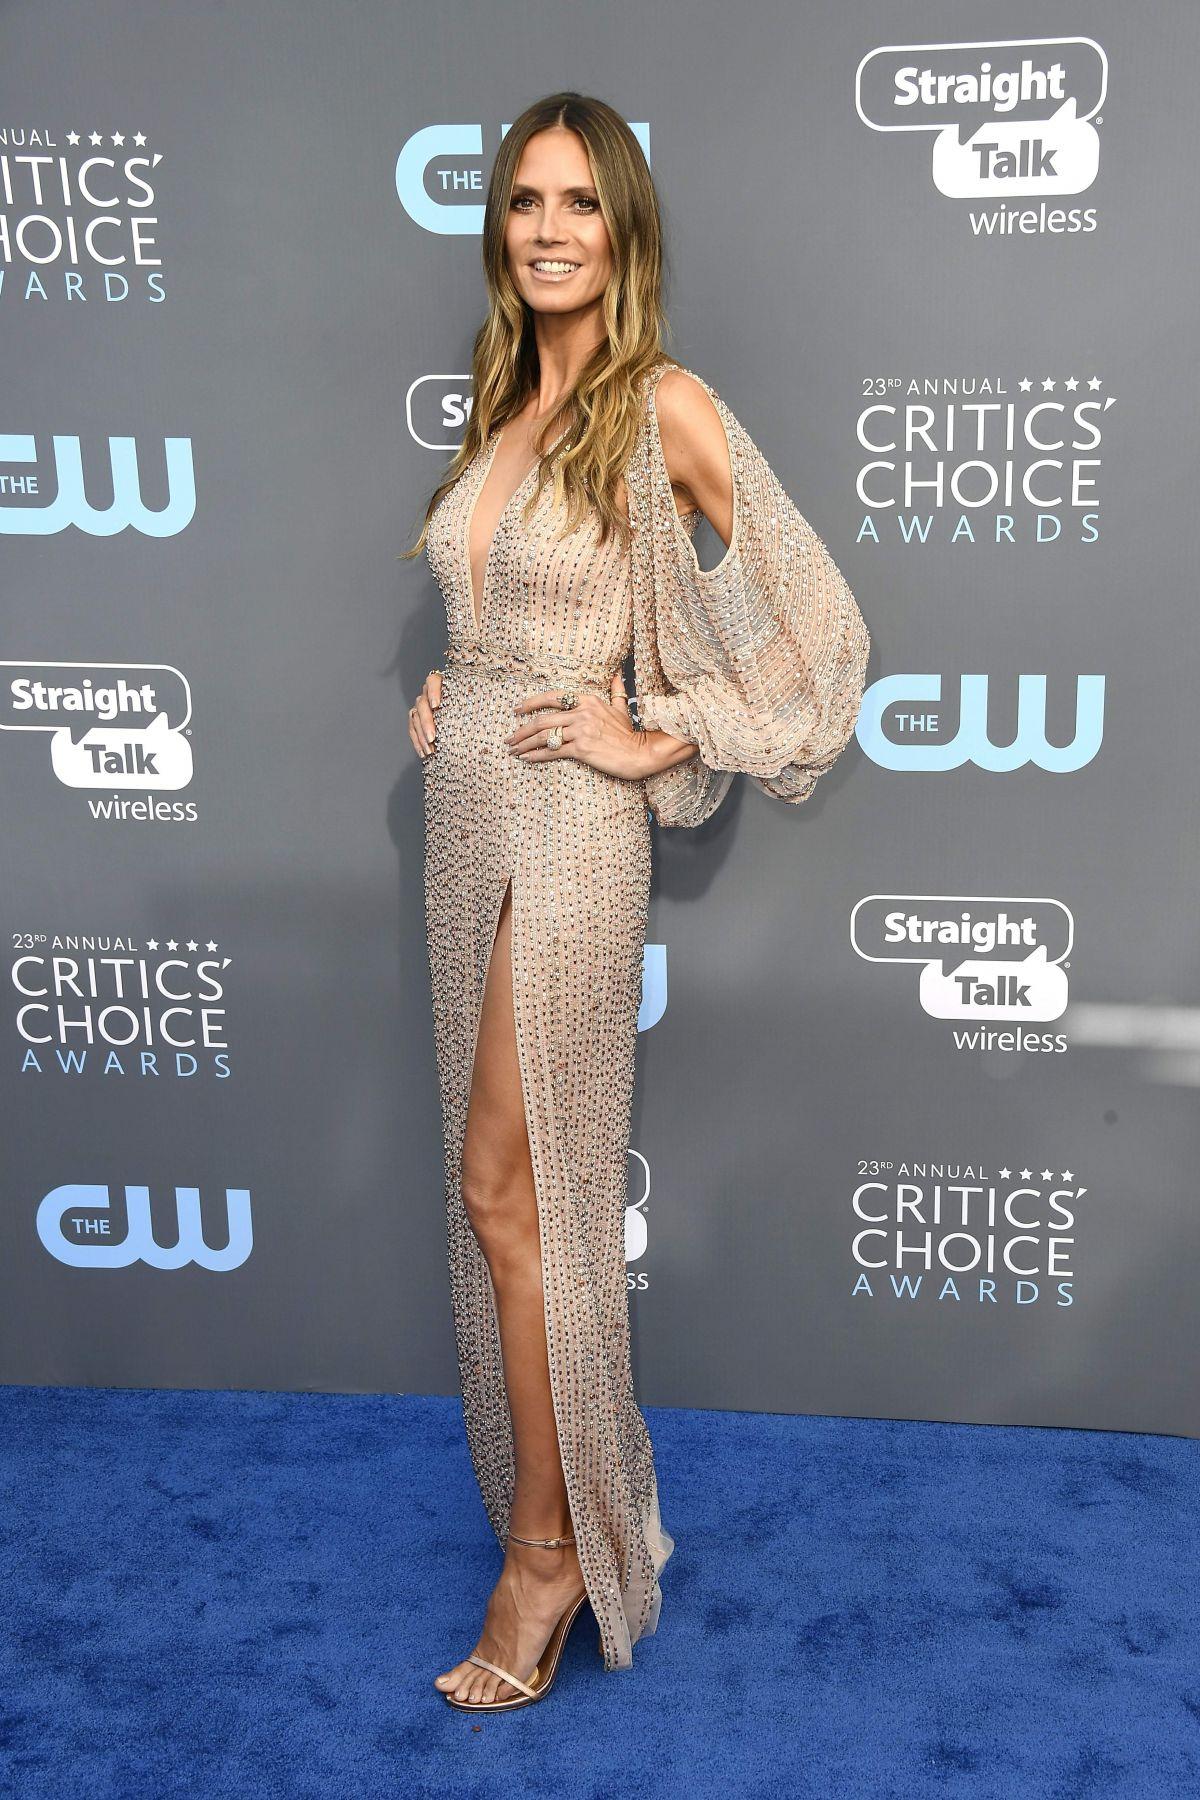 critics choice awards - photo #24